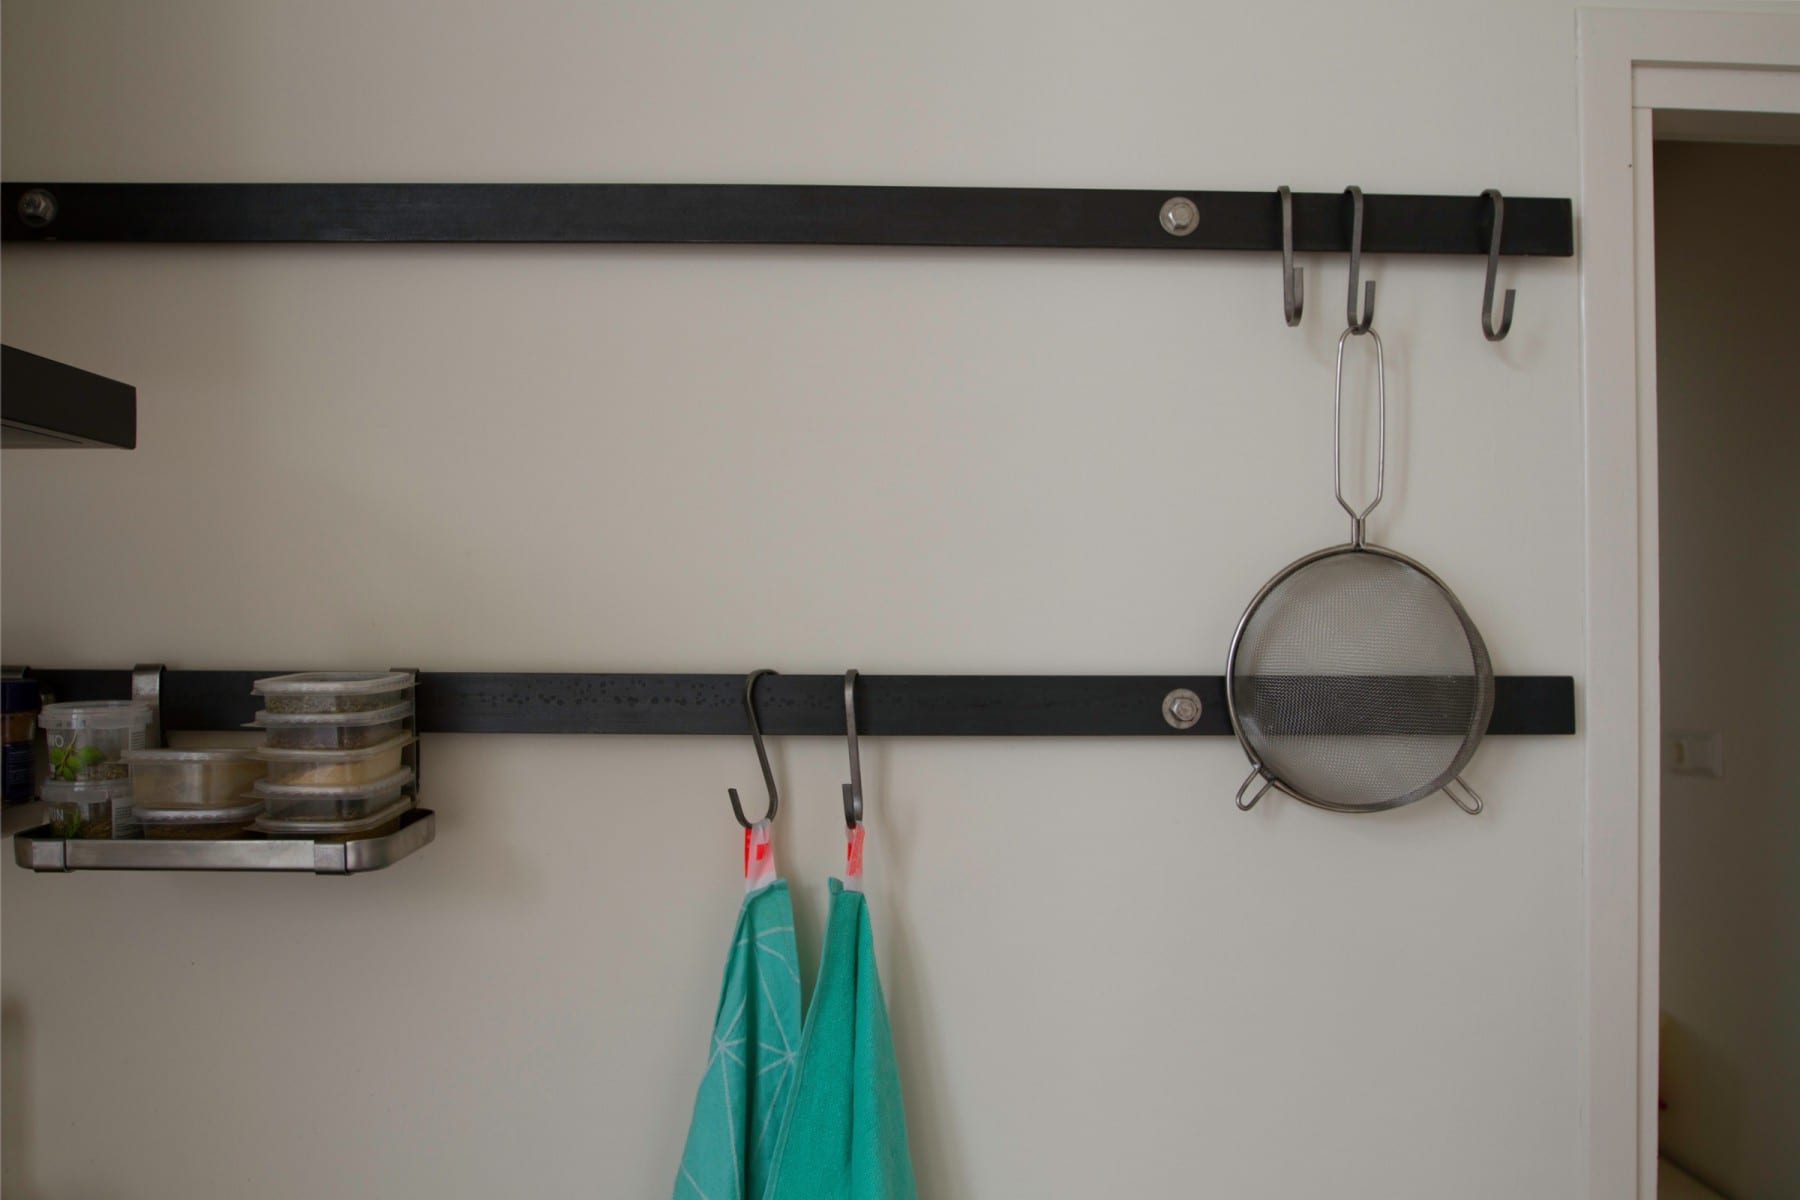 Design Keukenaccessoires : Keuken accessoires industrieel ...